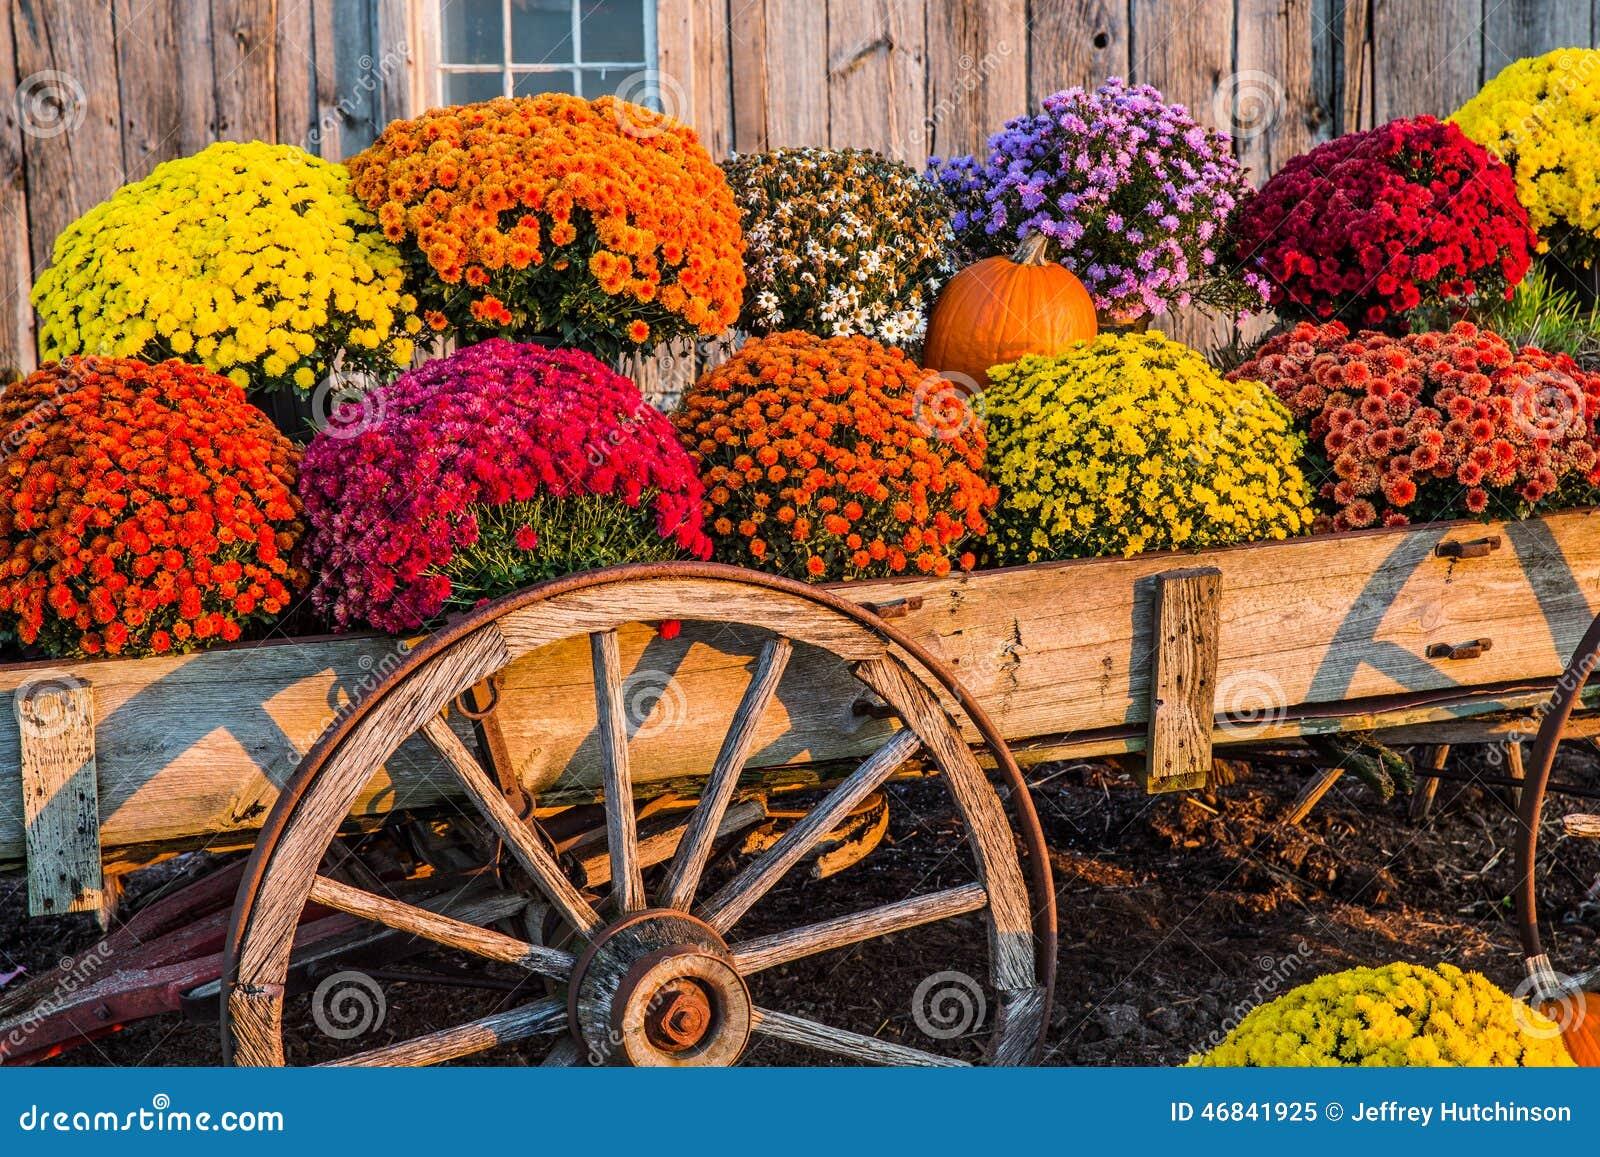 Fall Scene Stock Photo - Image: 46841925